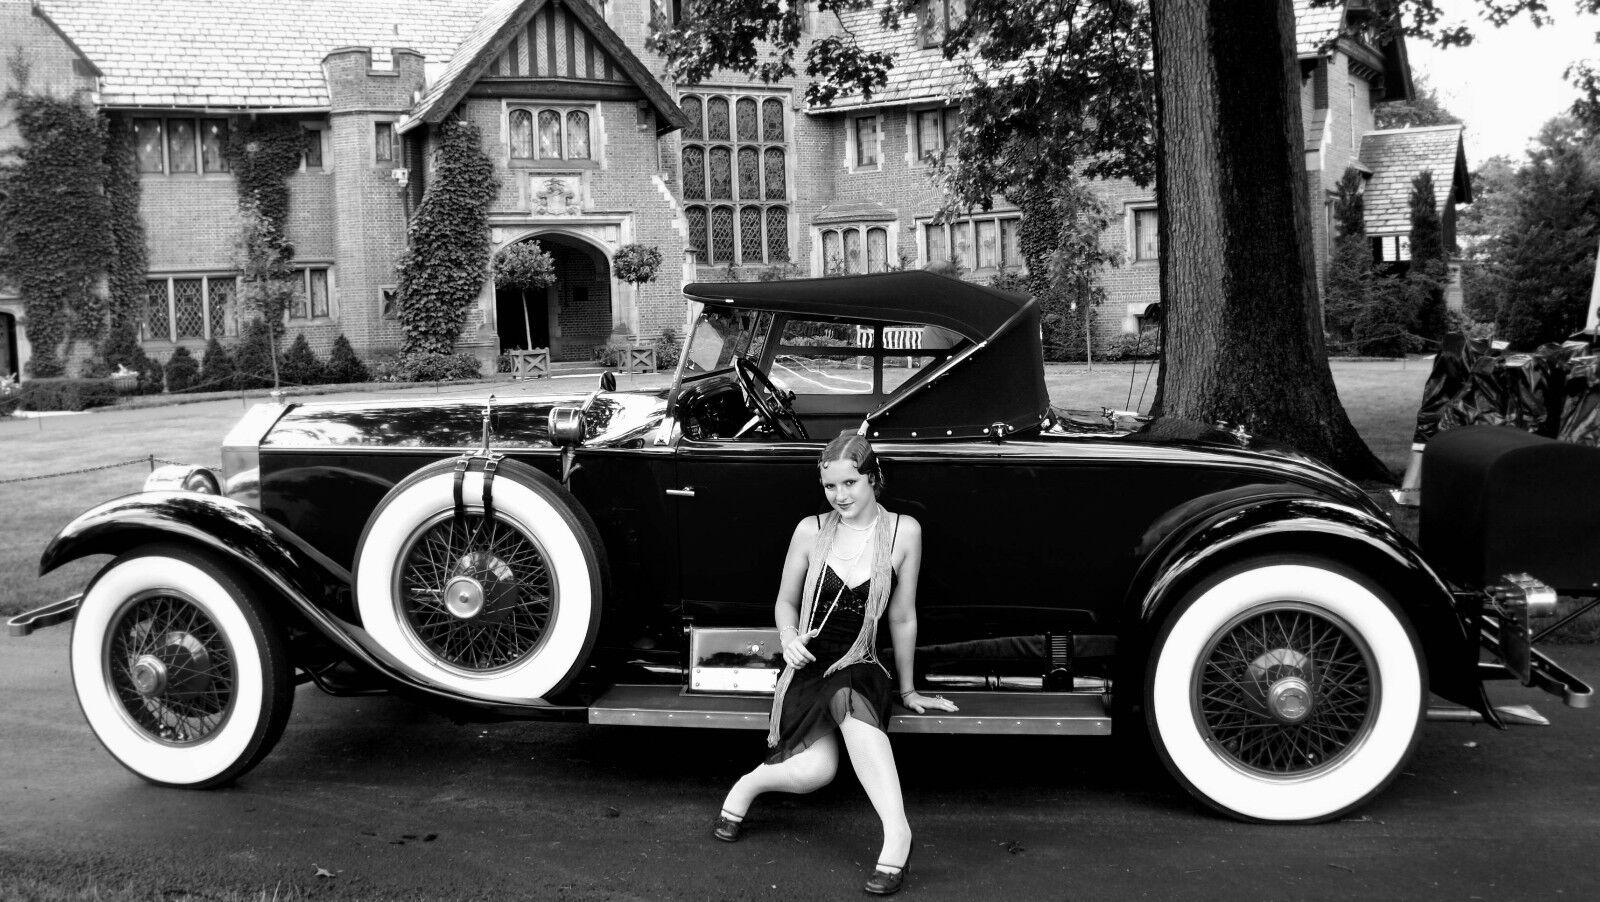 New York City Stylish Flappers photo  Classy Auto 1920's Jazz Prohibition